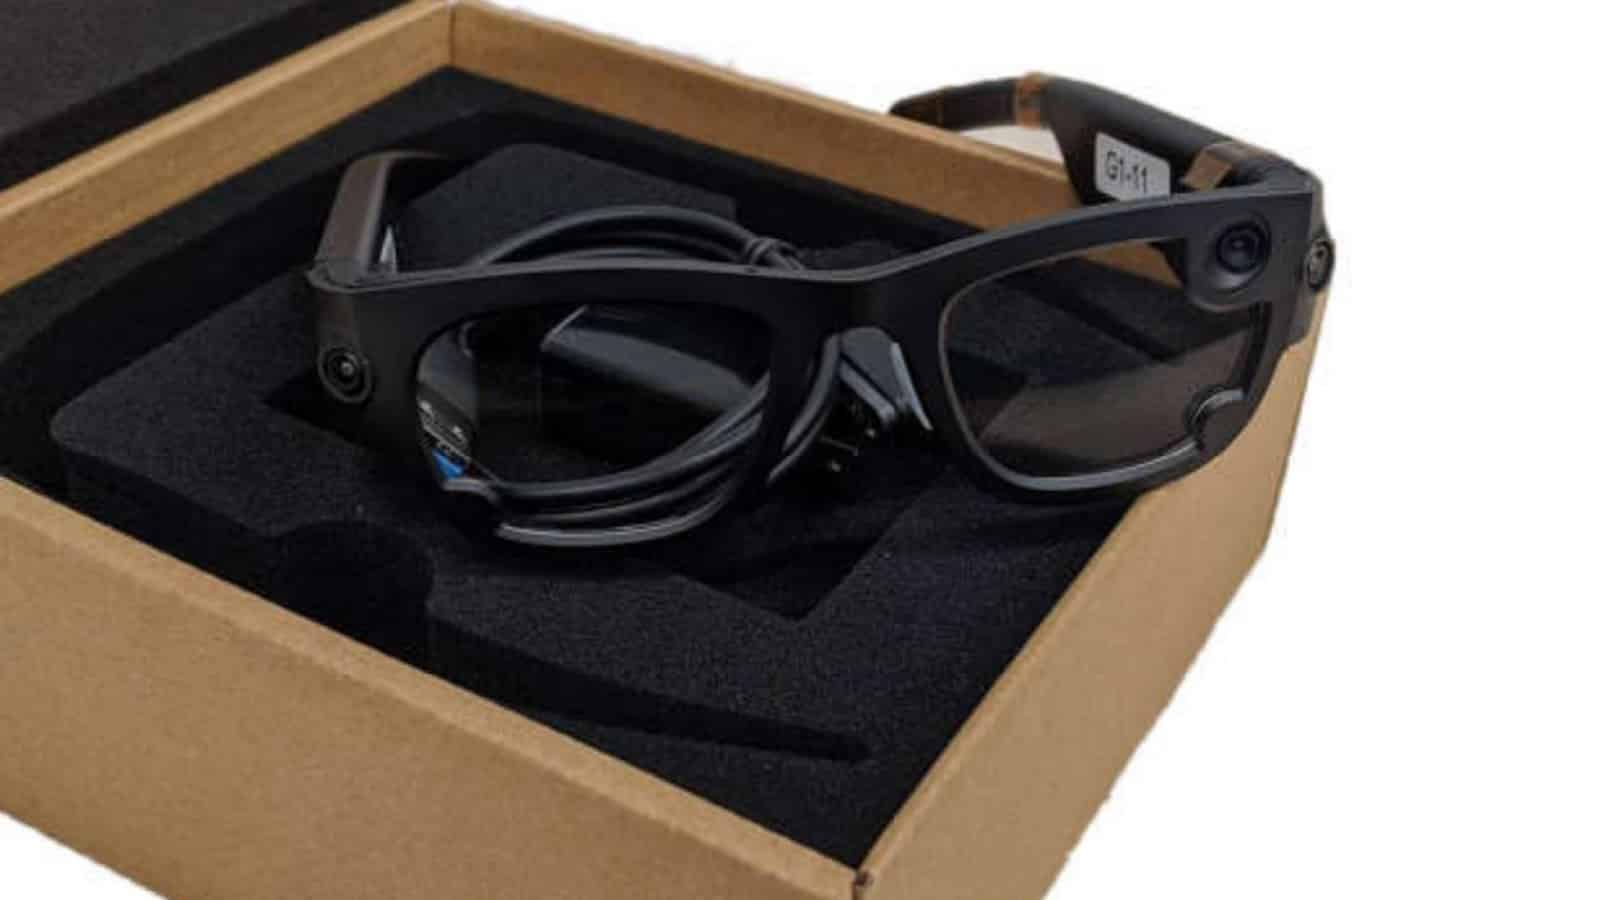 facebook's AR glasses, gemini, on top of its packaging